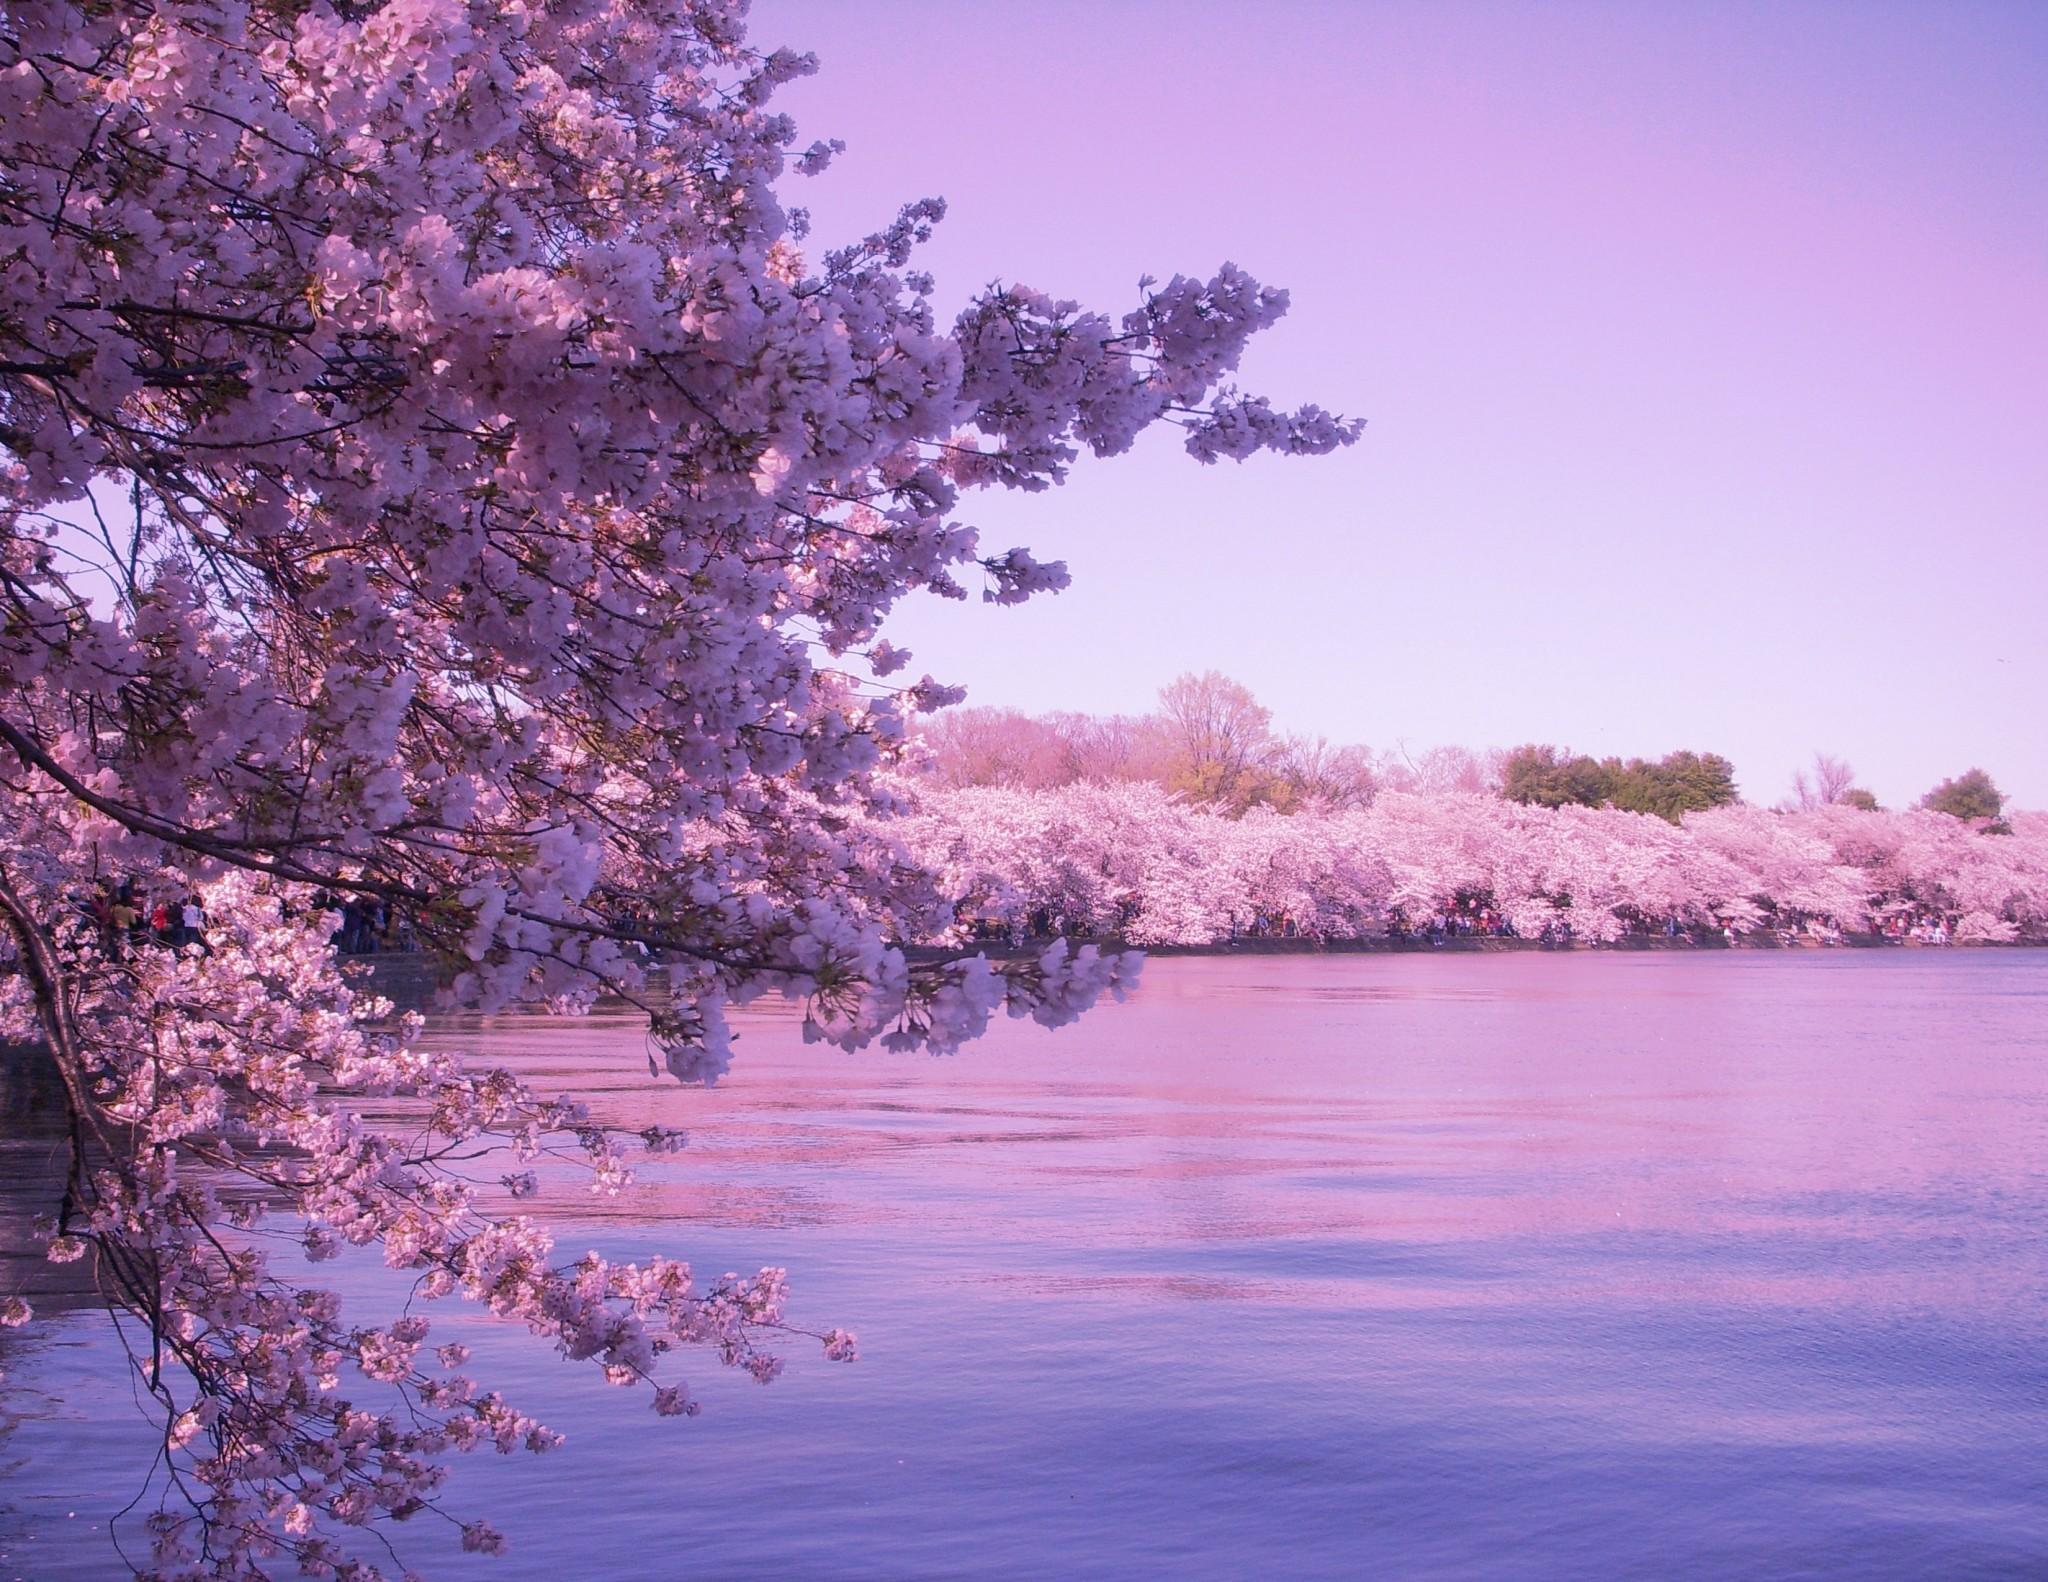 sakura blossom background